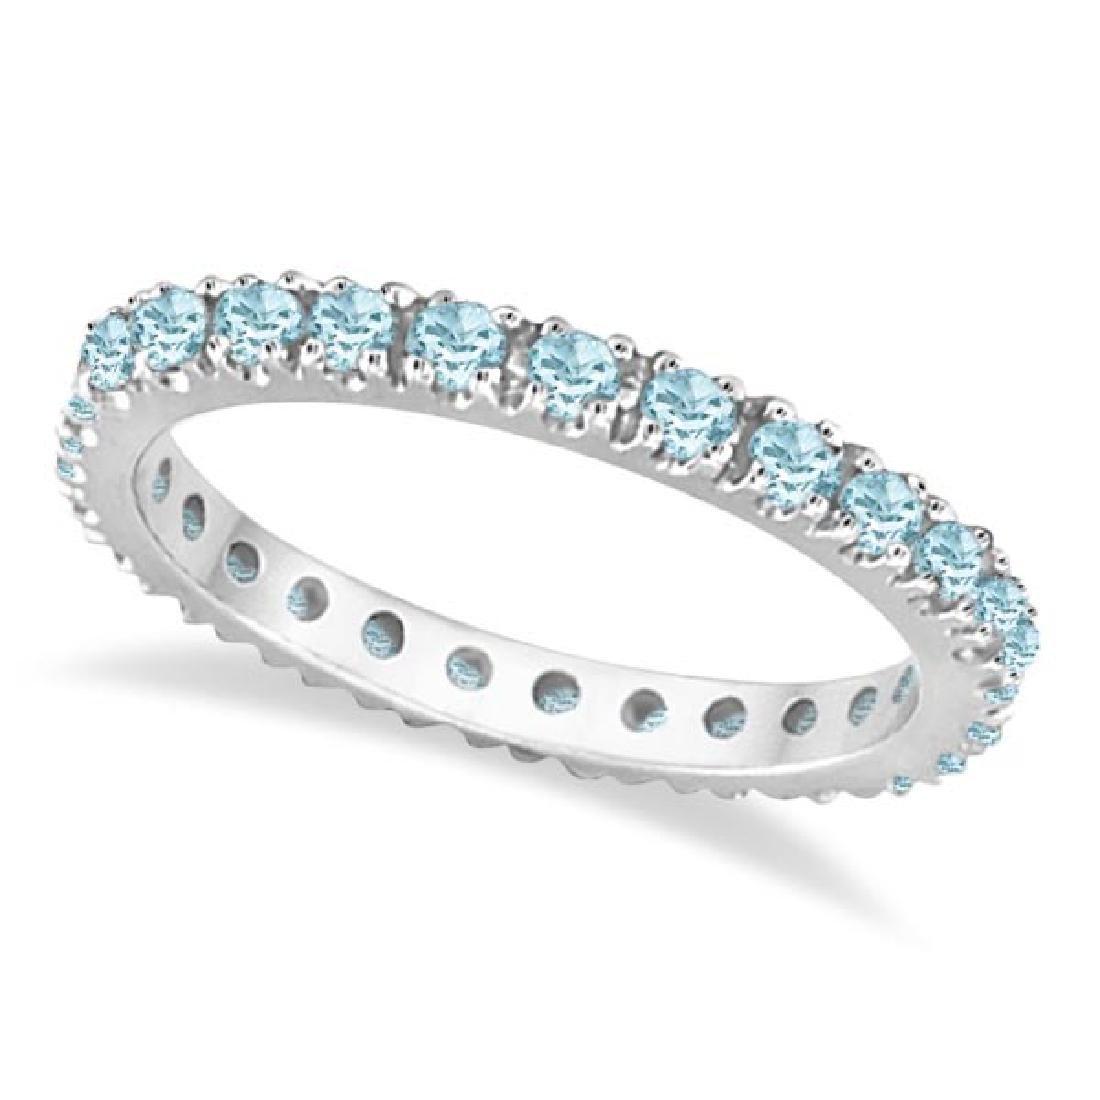 Aquamarine Eternity Stackable Ring Guard Band 14K White